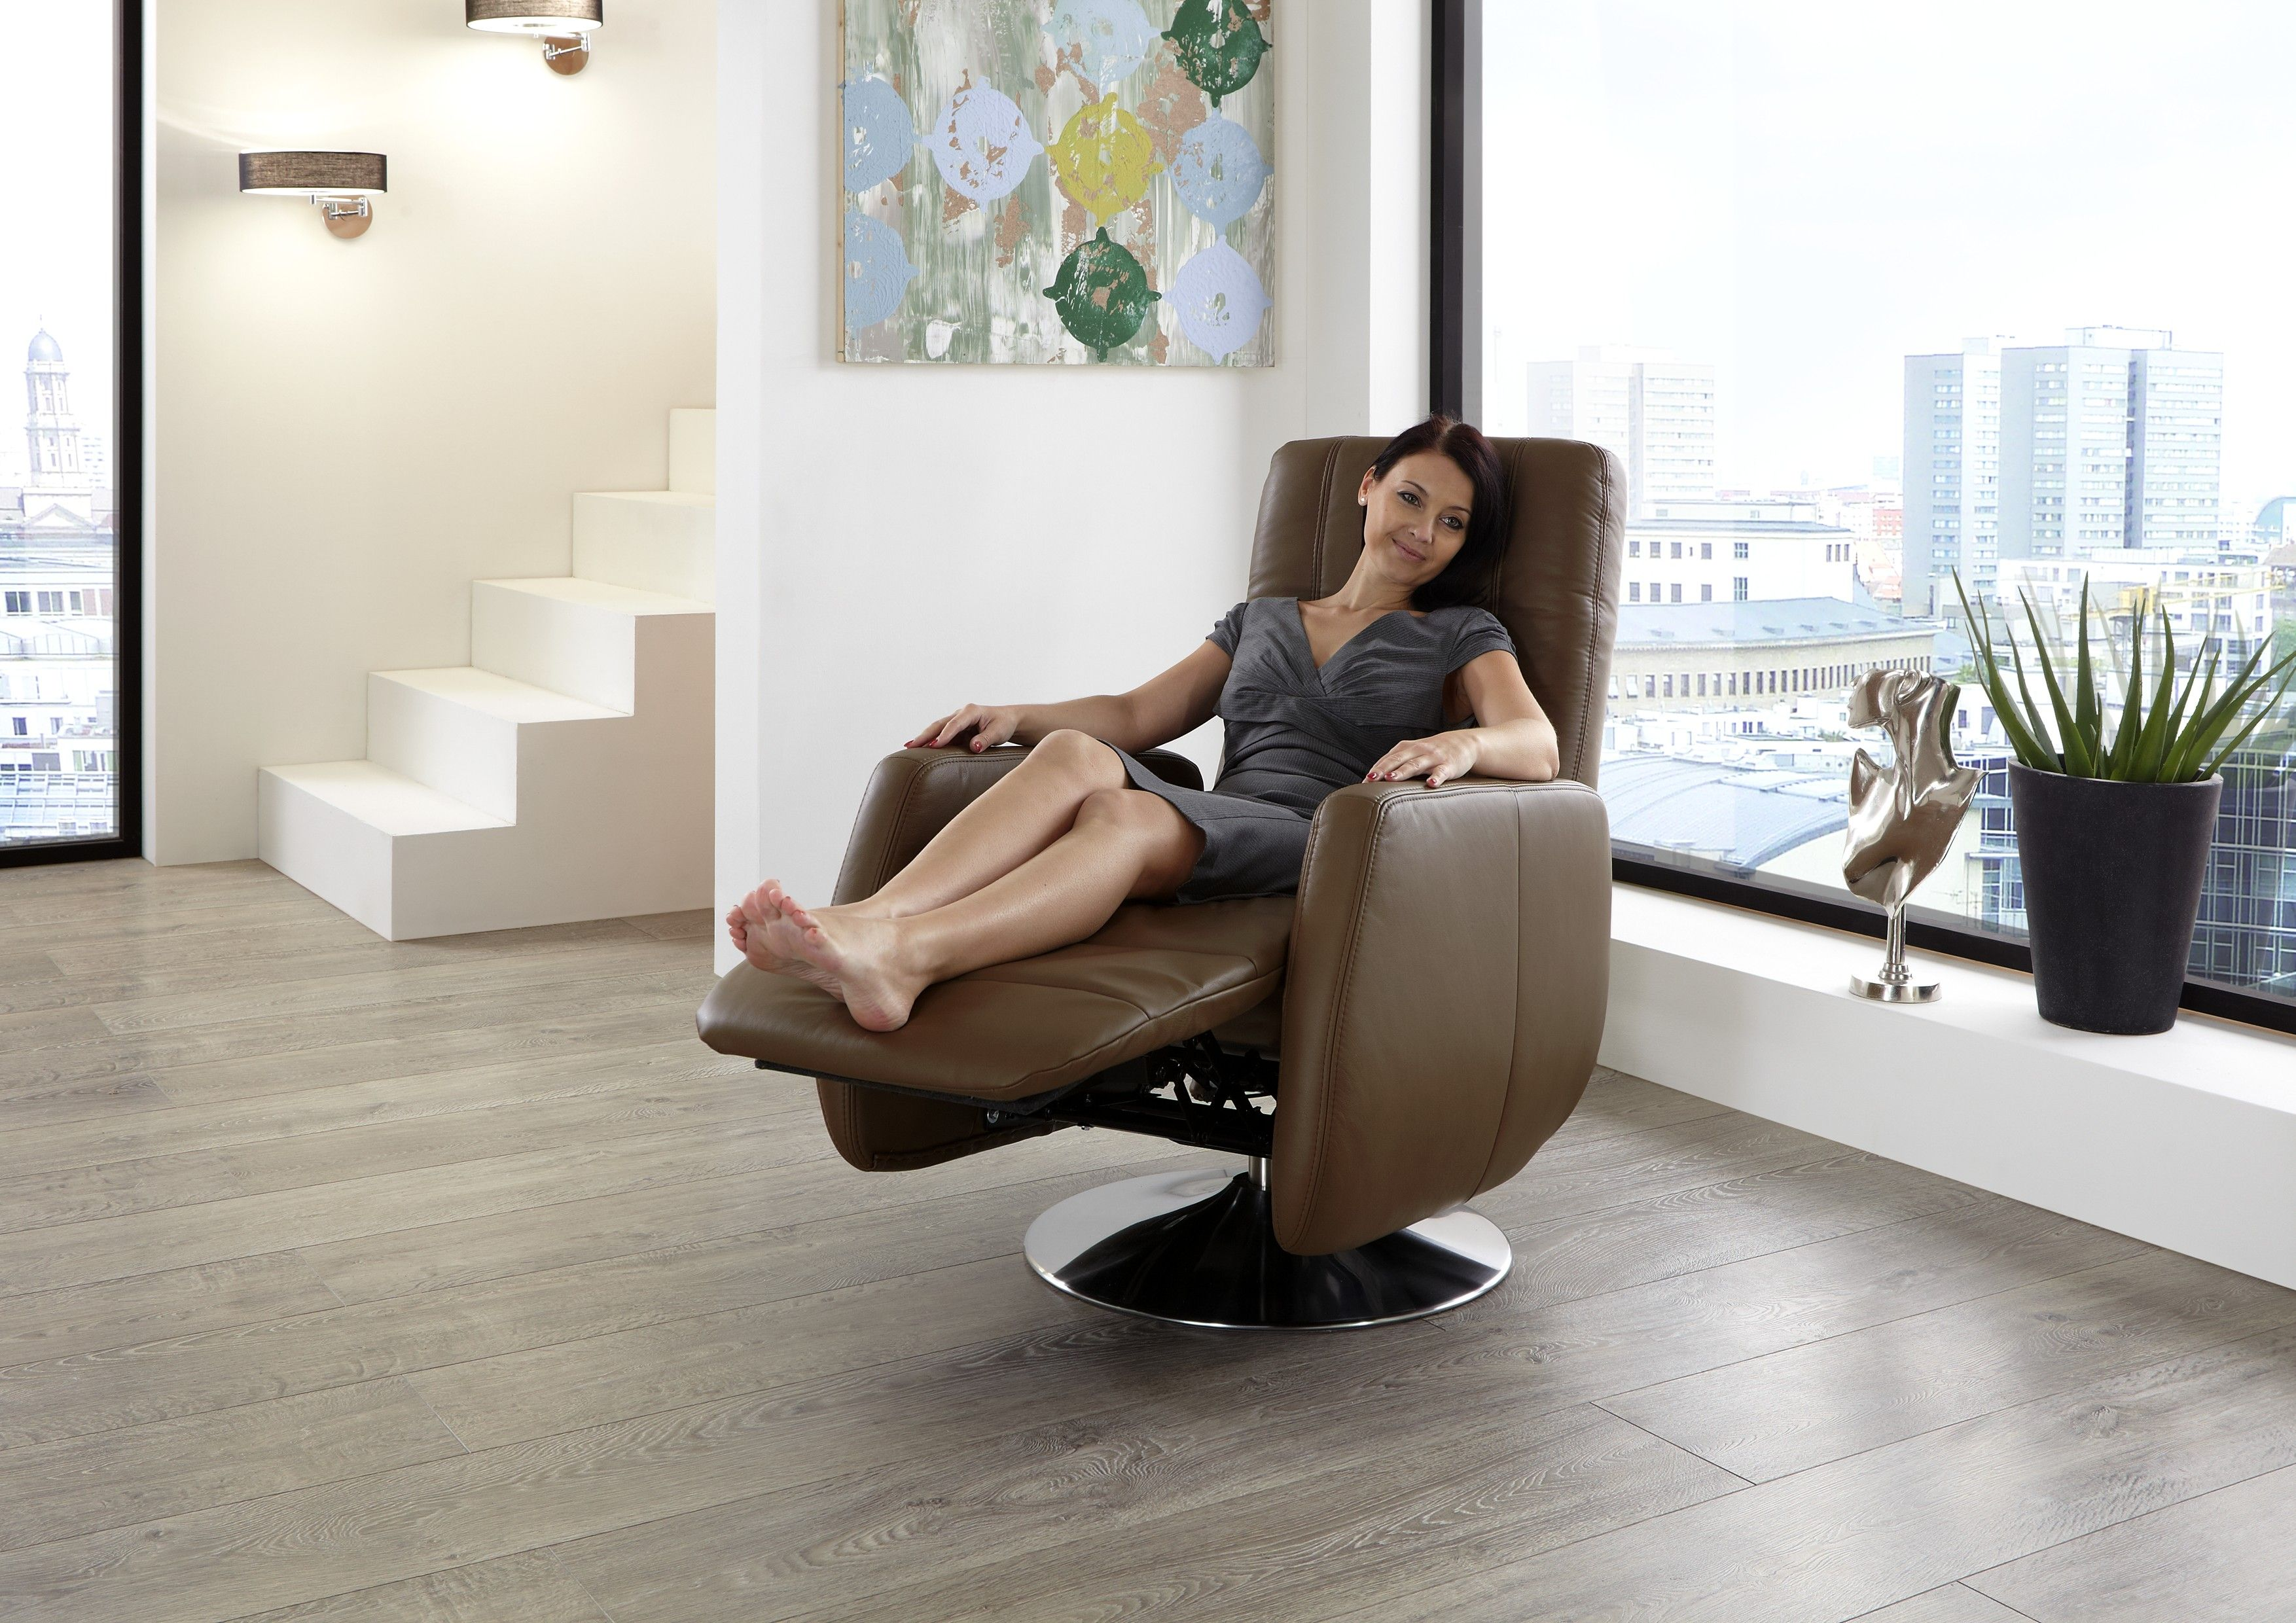 Počivalnik. Chair, Furniture, Recliner chair